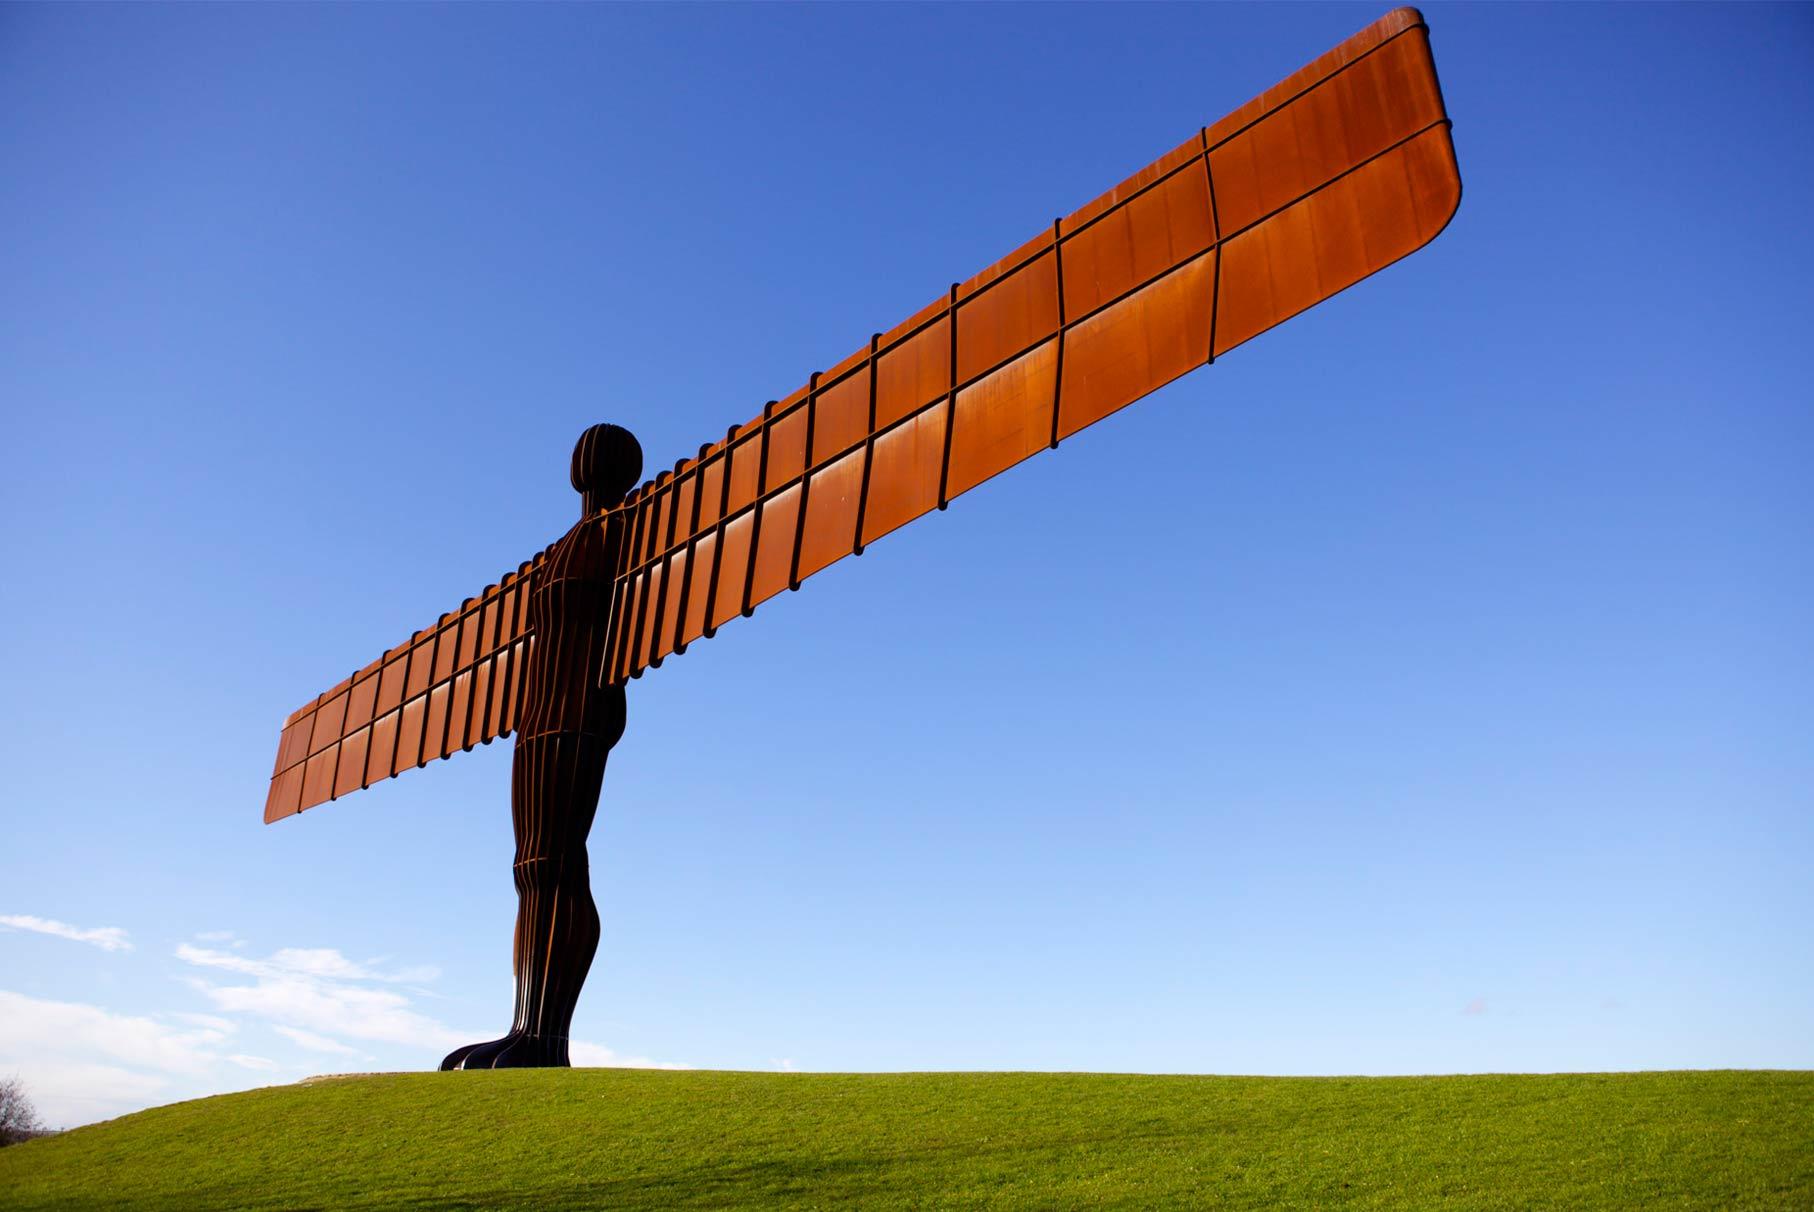 Angel of the North, Gateshead England